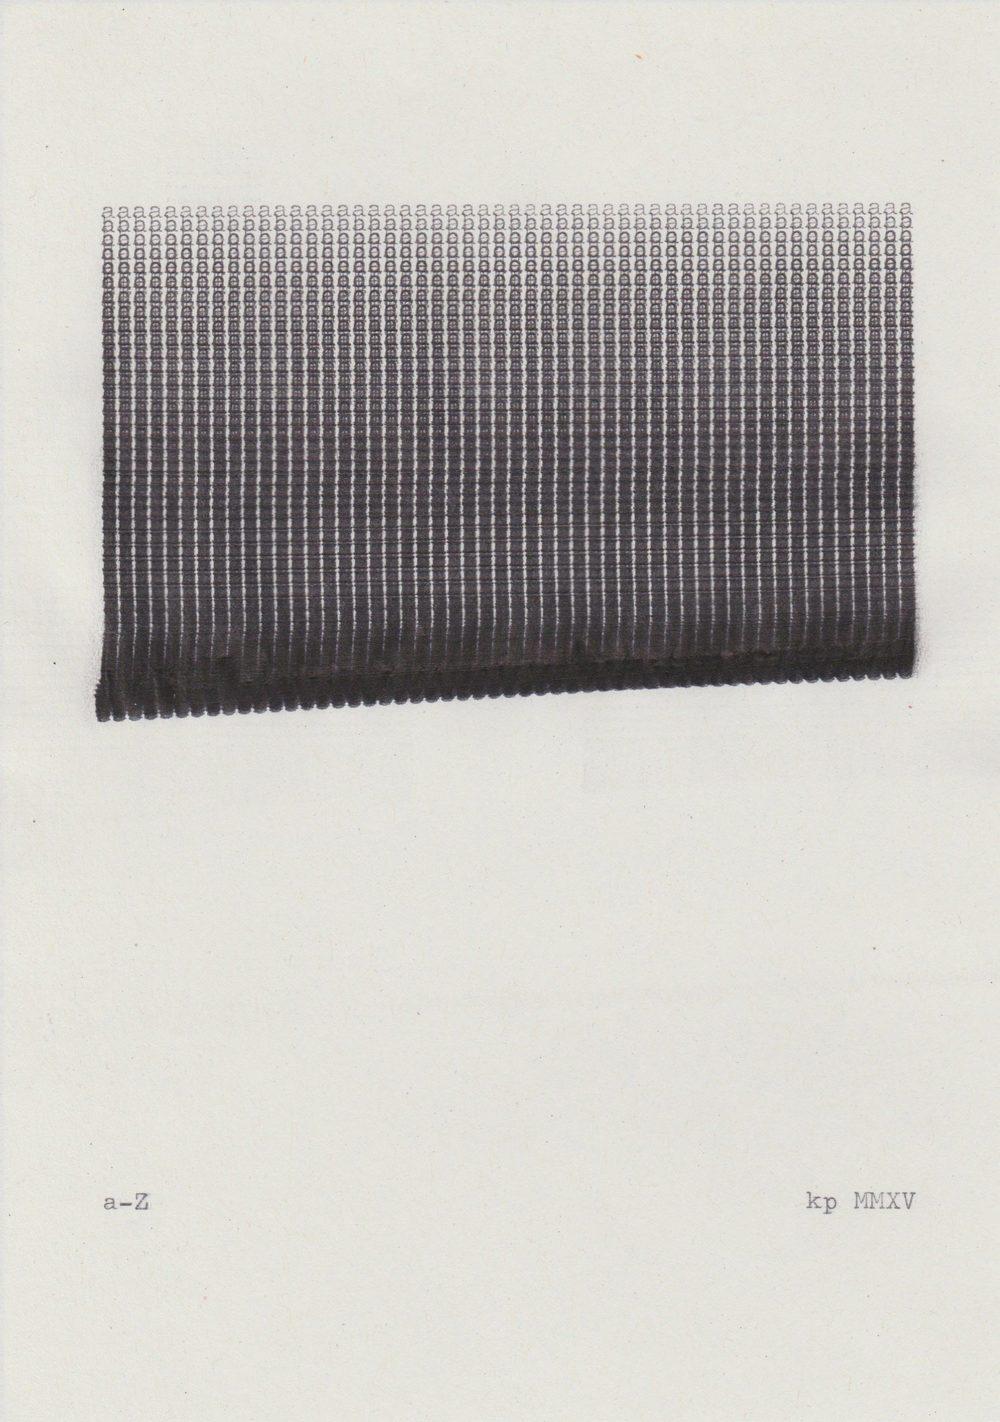 Kasper Pincis, a-Z (2015), typewriter on paper, 14.8 x 21 cm